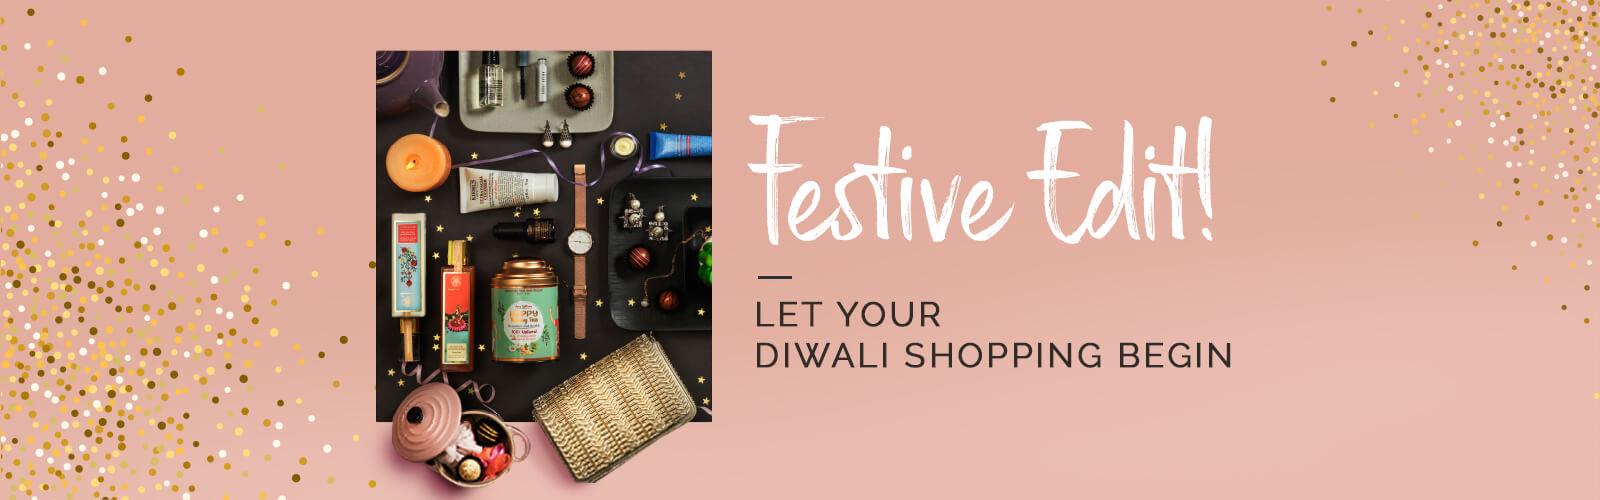 diwali-gifting-guide